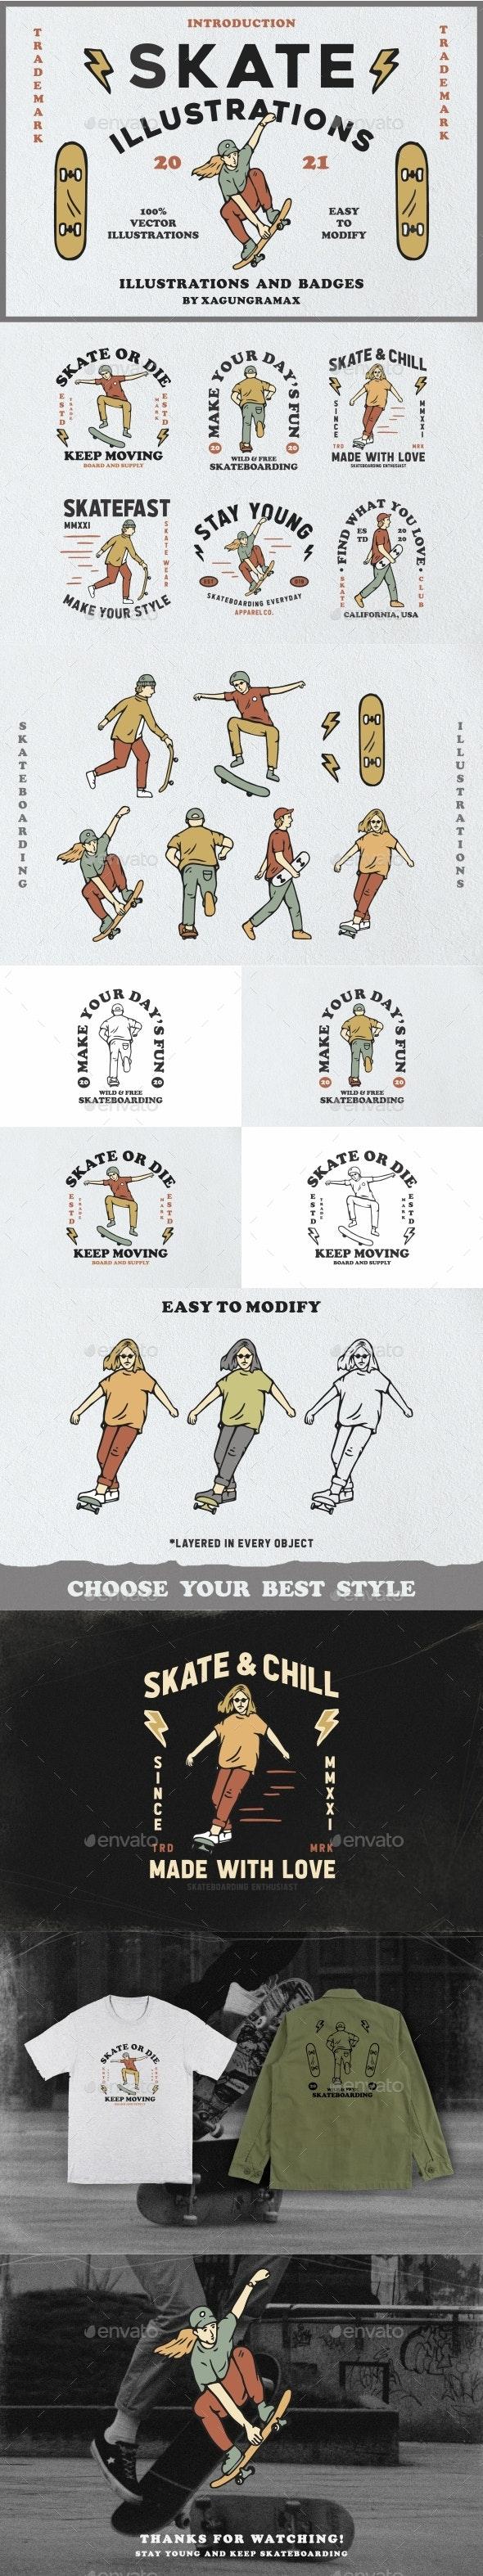 Skate Illustration And Badges - People Illustrations